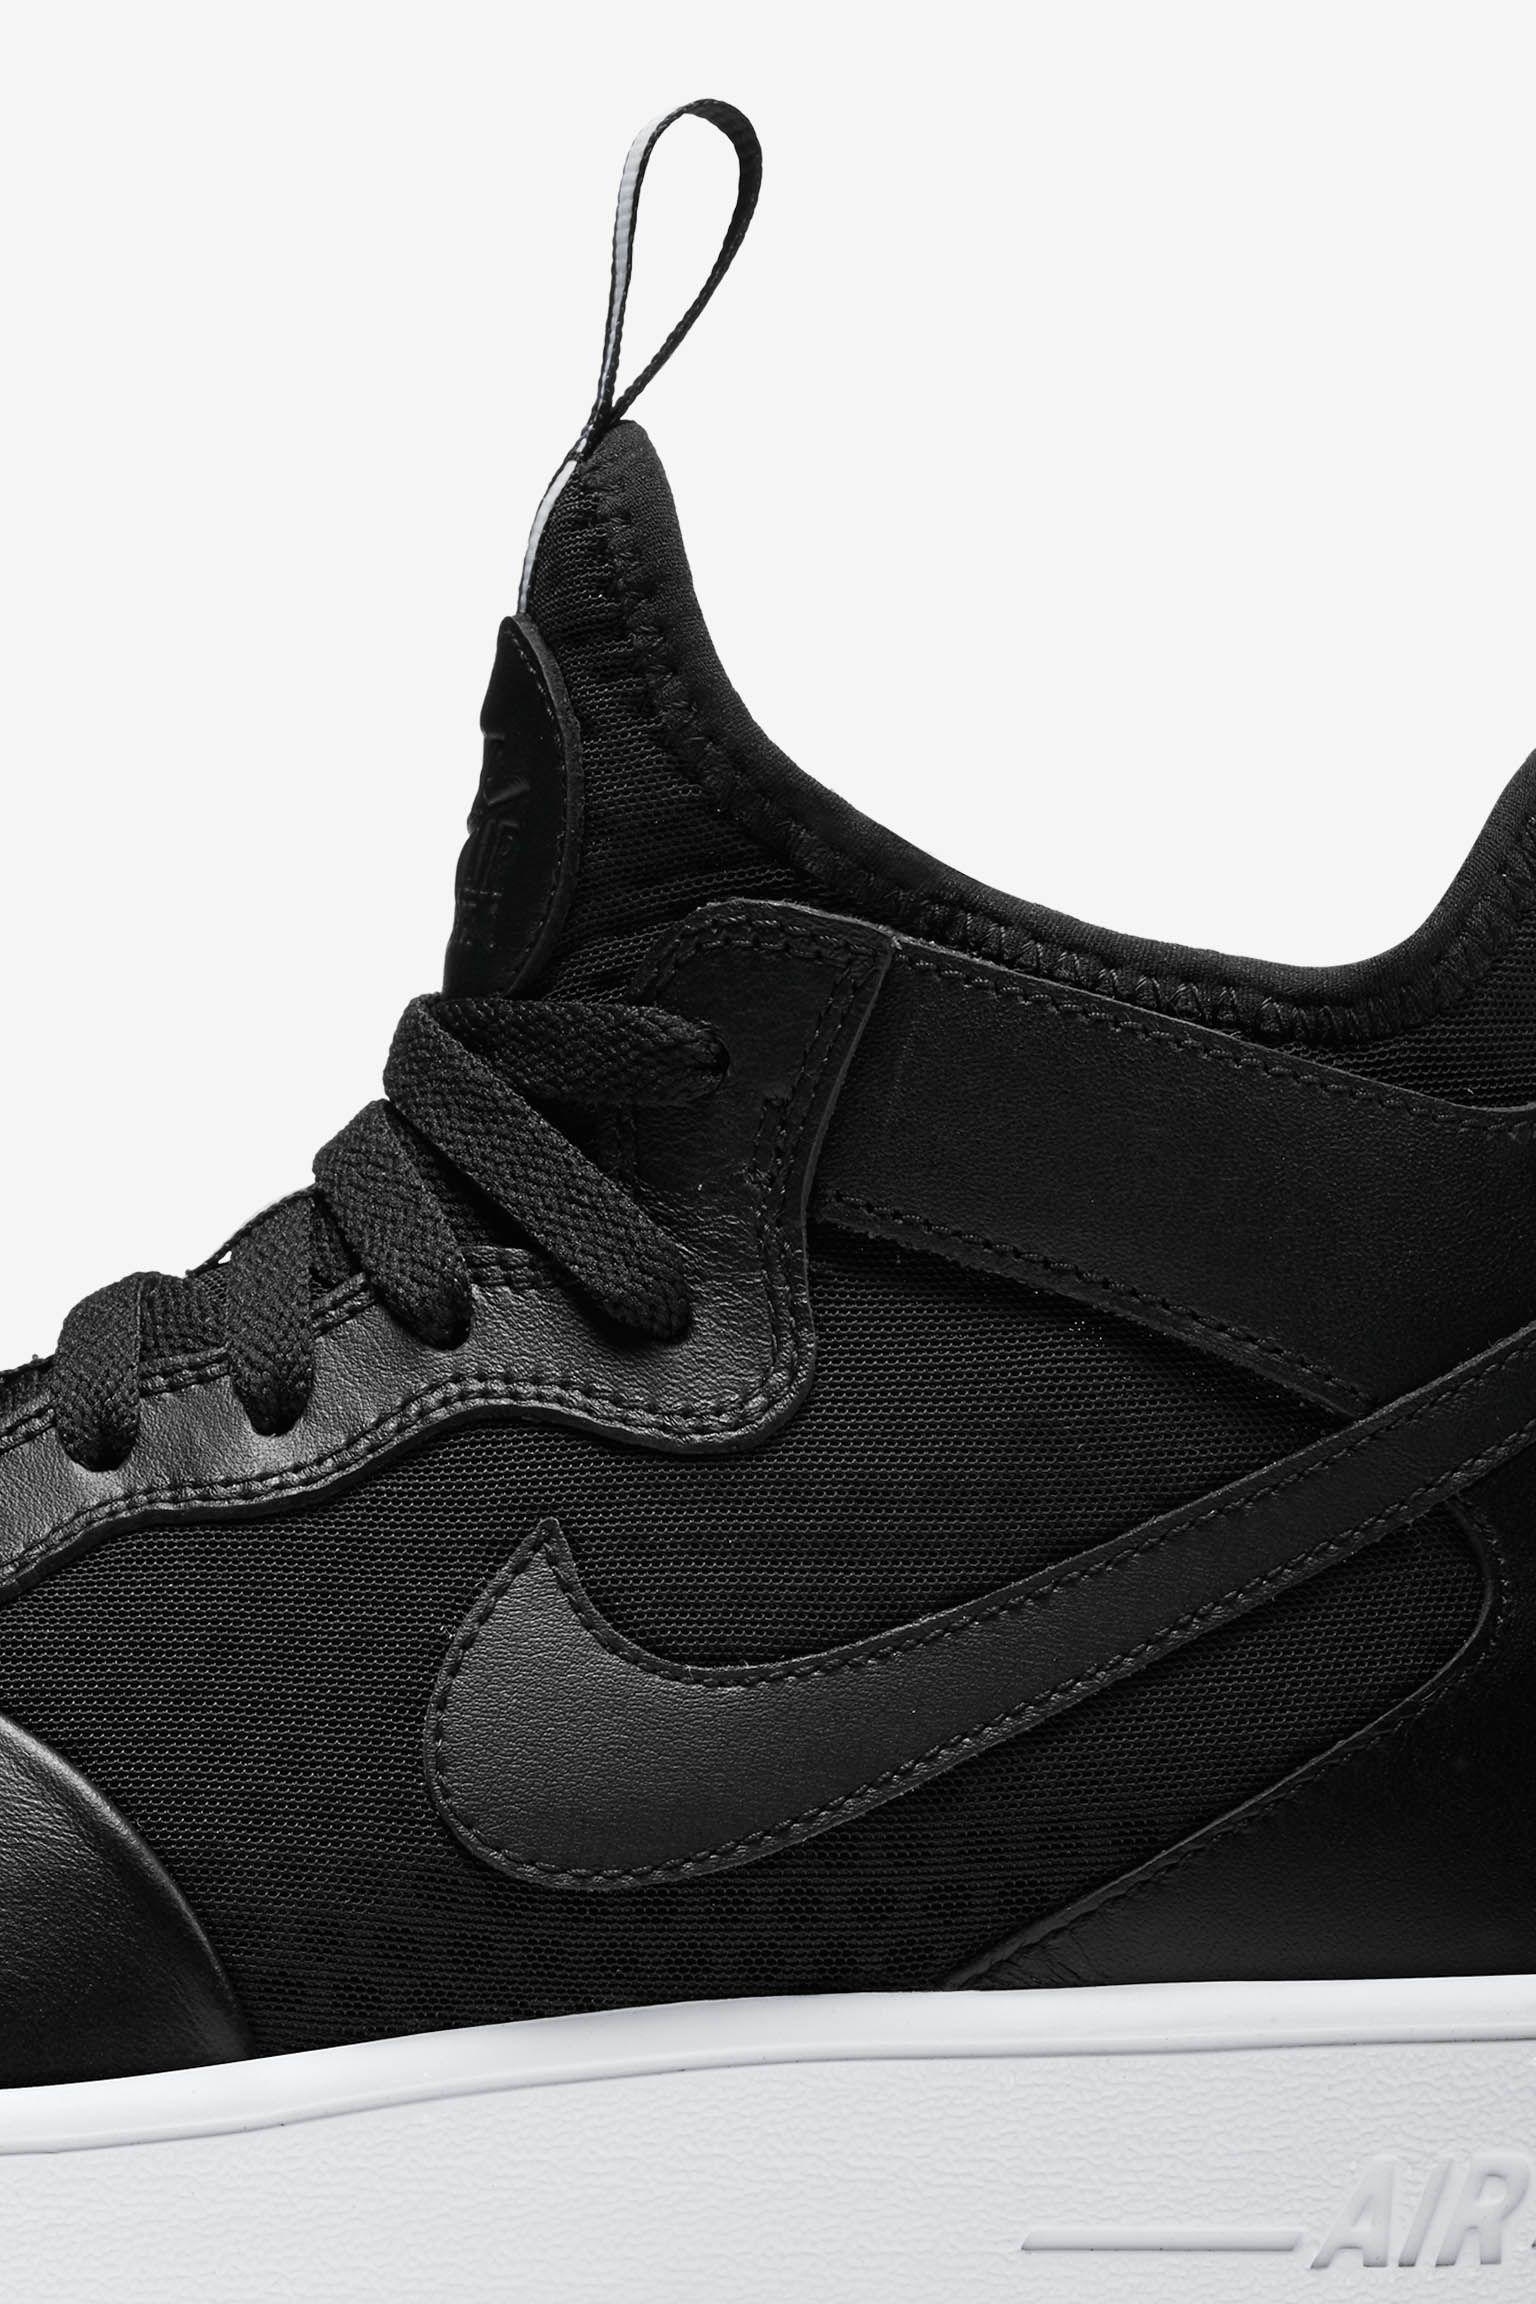 Nike Air Force 1 Ultra Force Mid « Black & White »